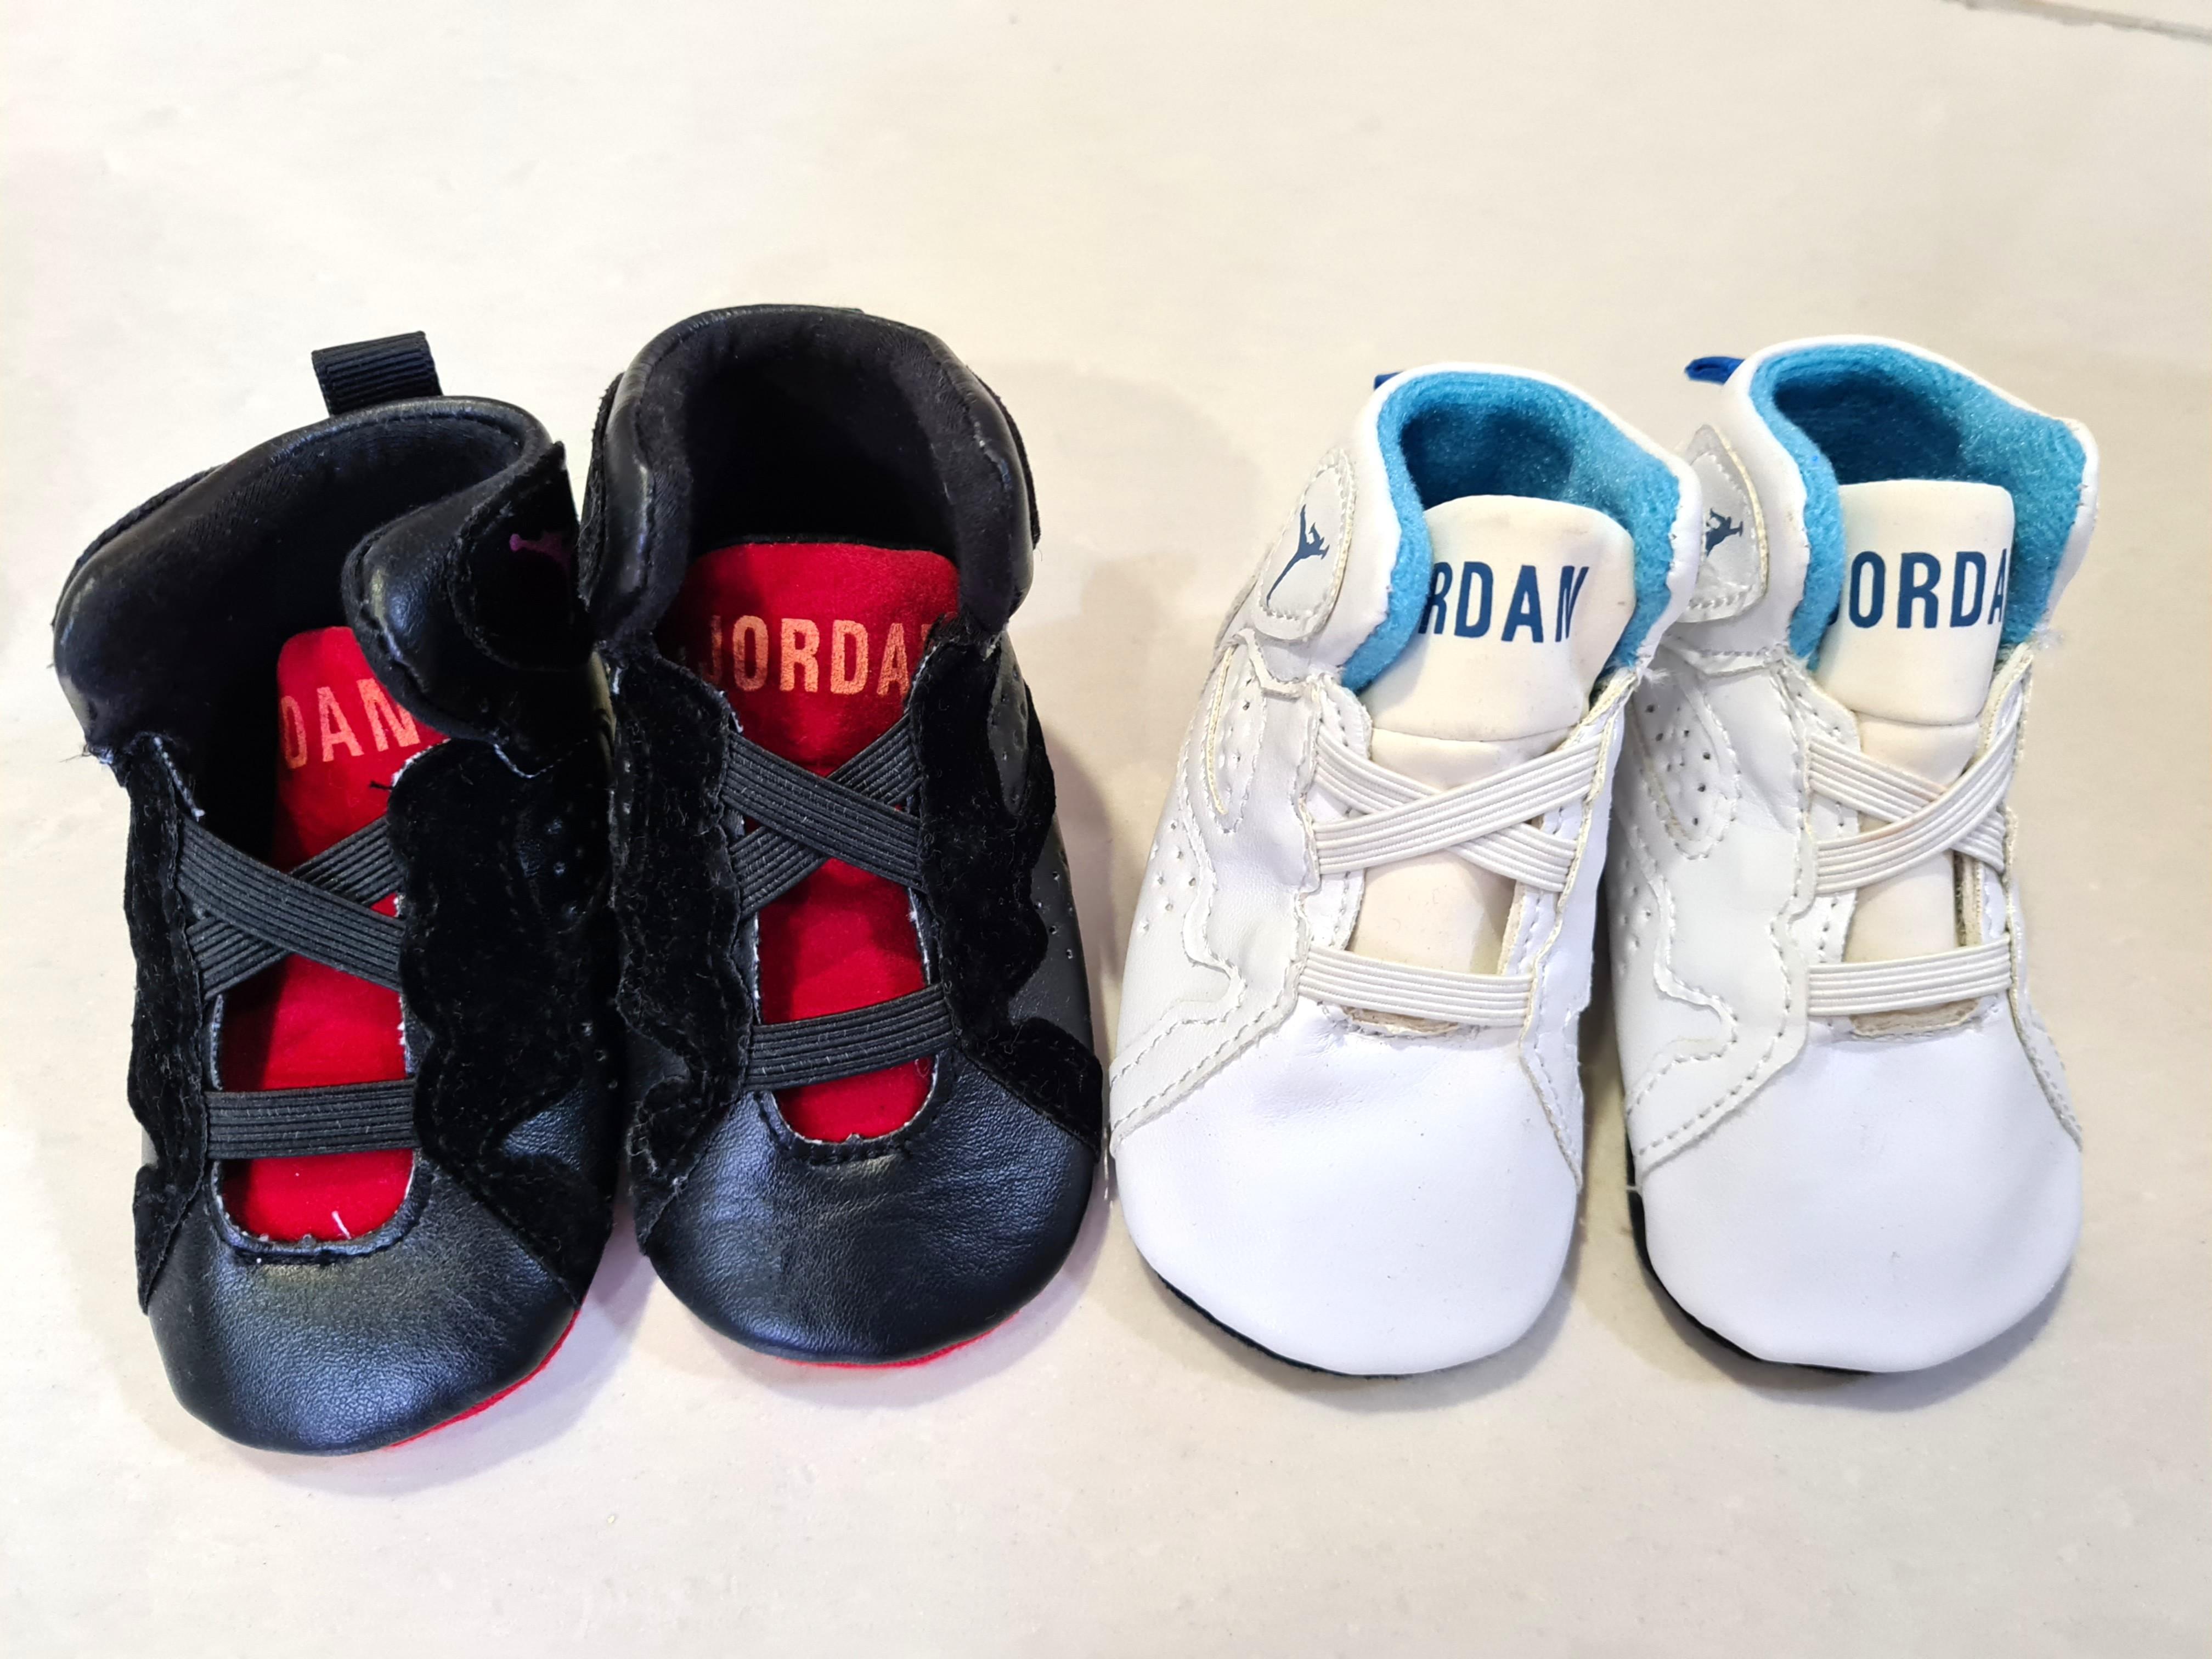 2 pairs Baby Jordan Shoes Newborn